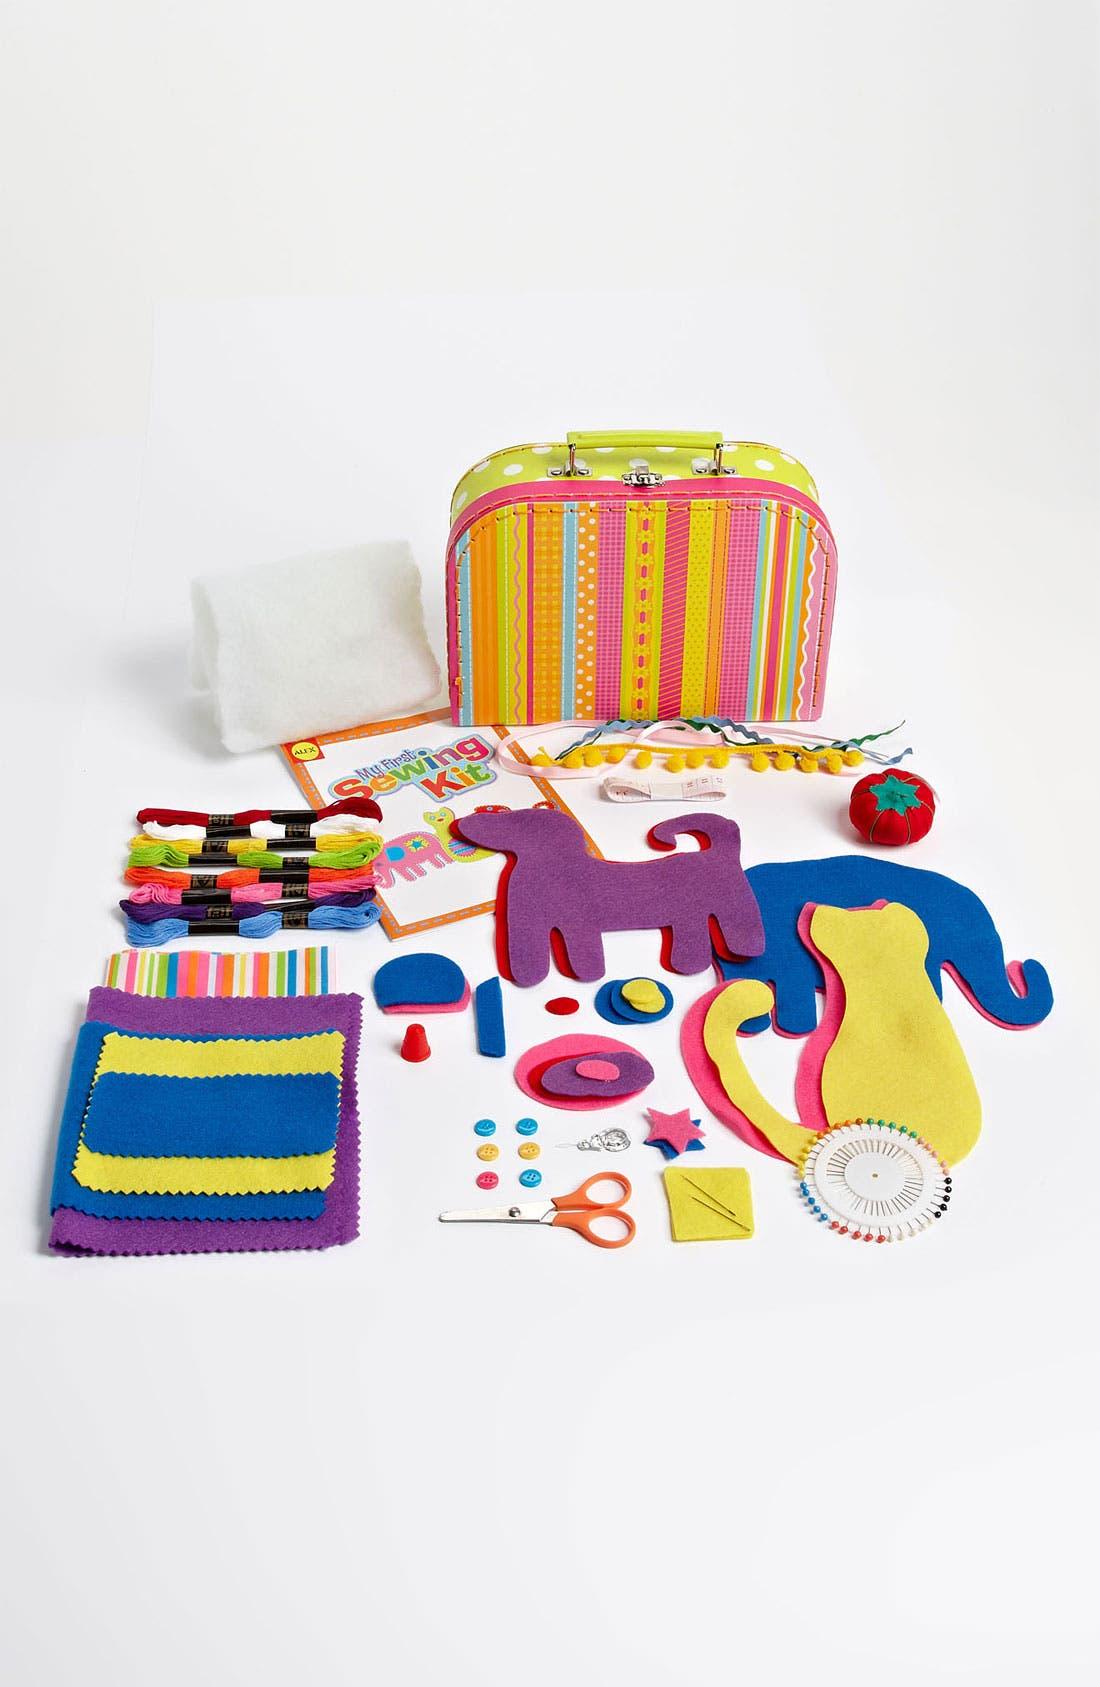 Main Image - Alex® Toys 'My First Sewing Kit' Craft Kit